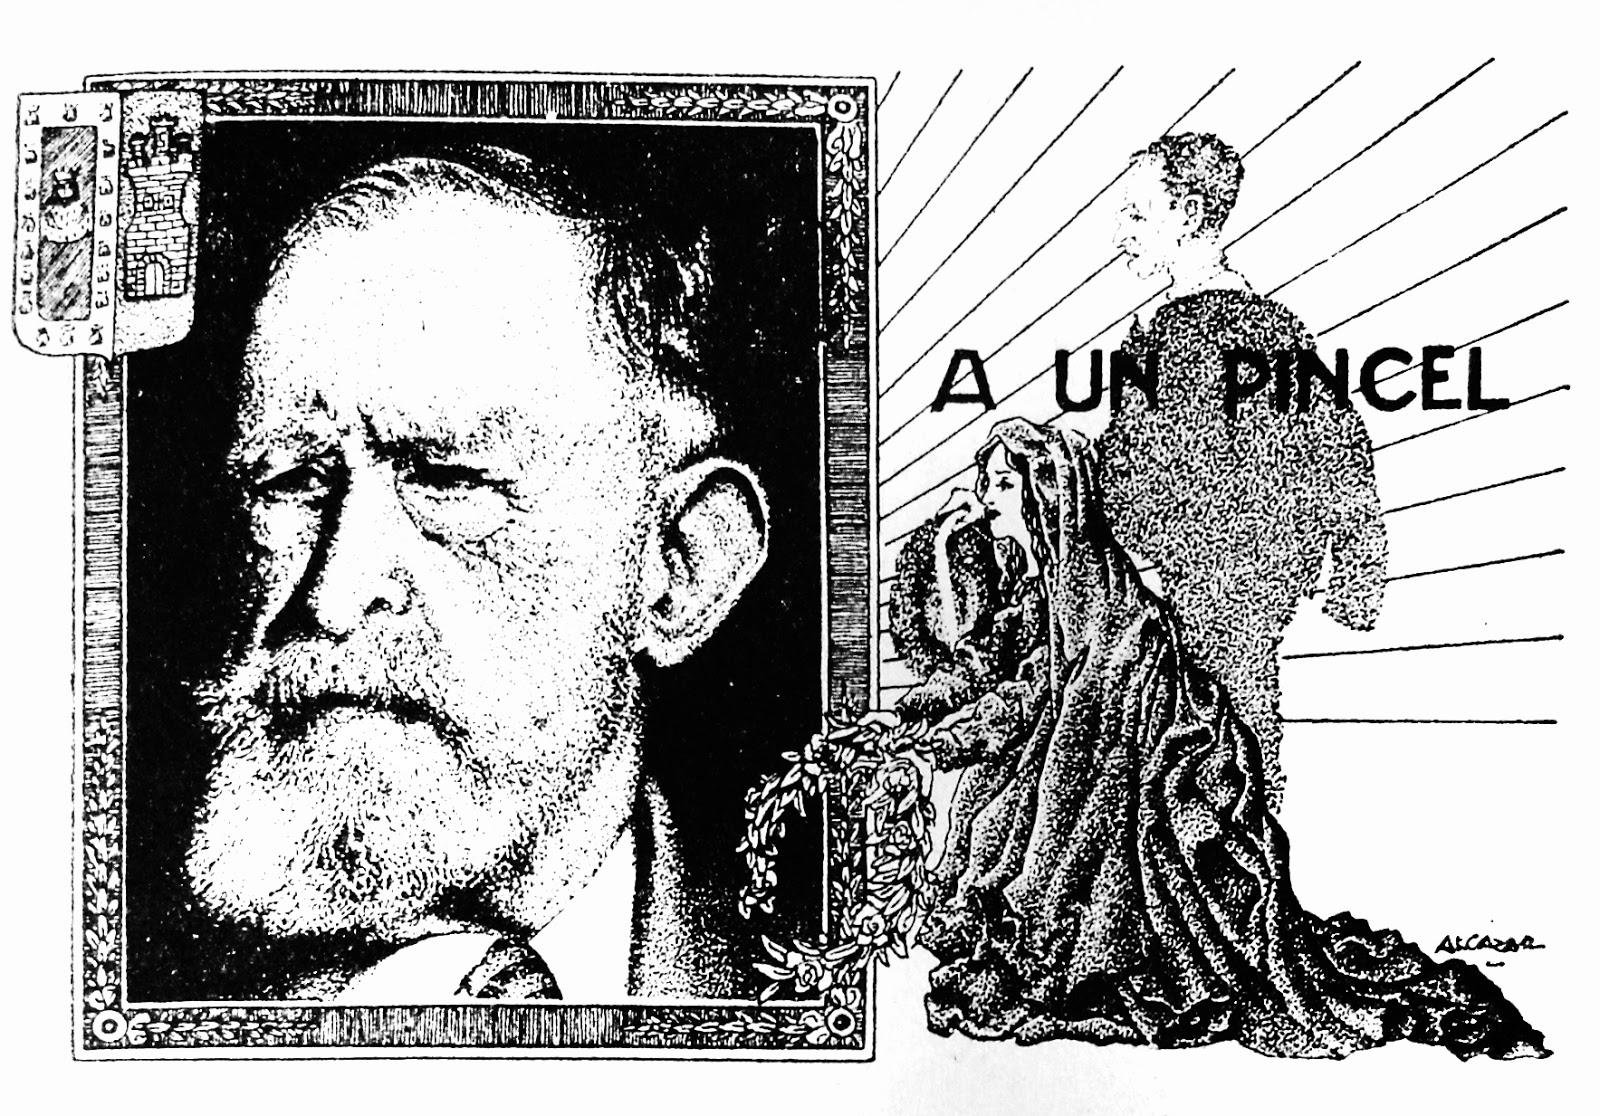 Amador Porres, Alcazar, a un pincel